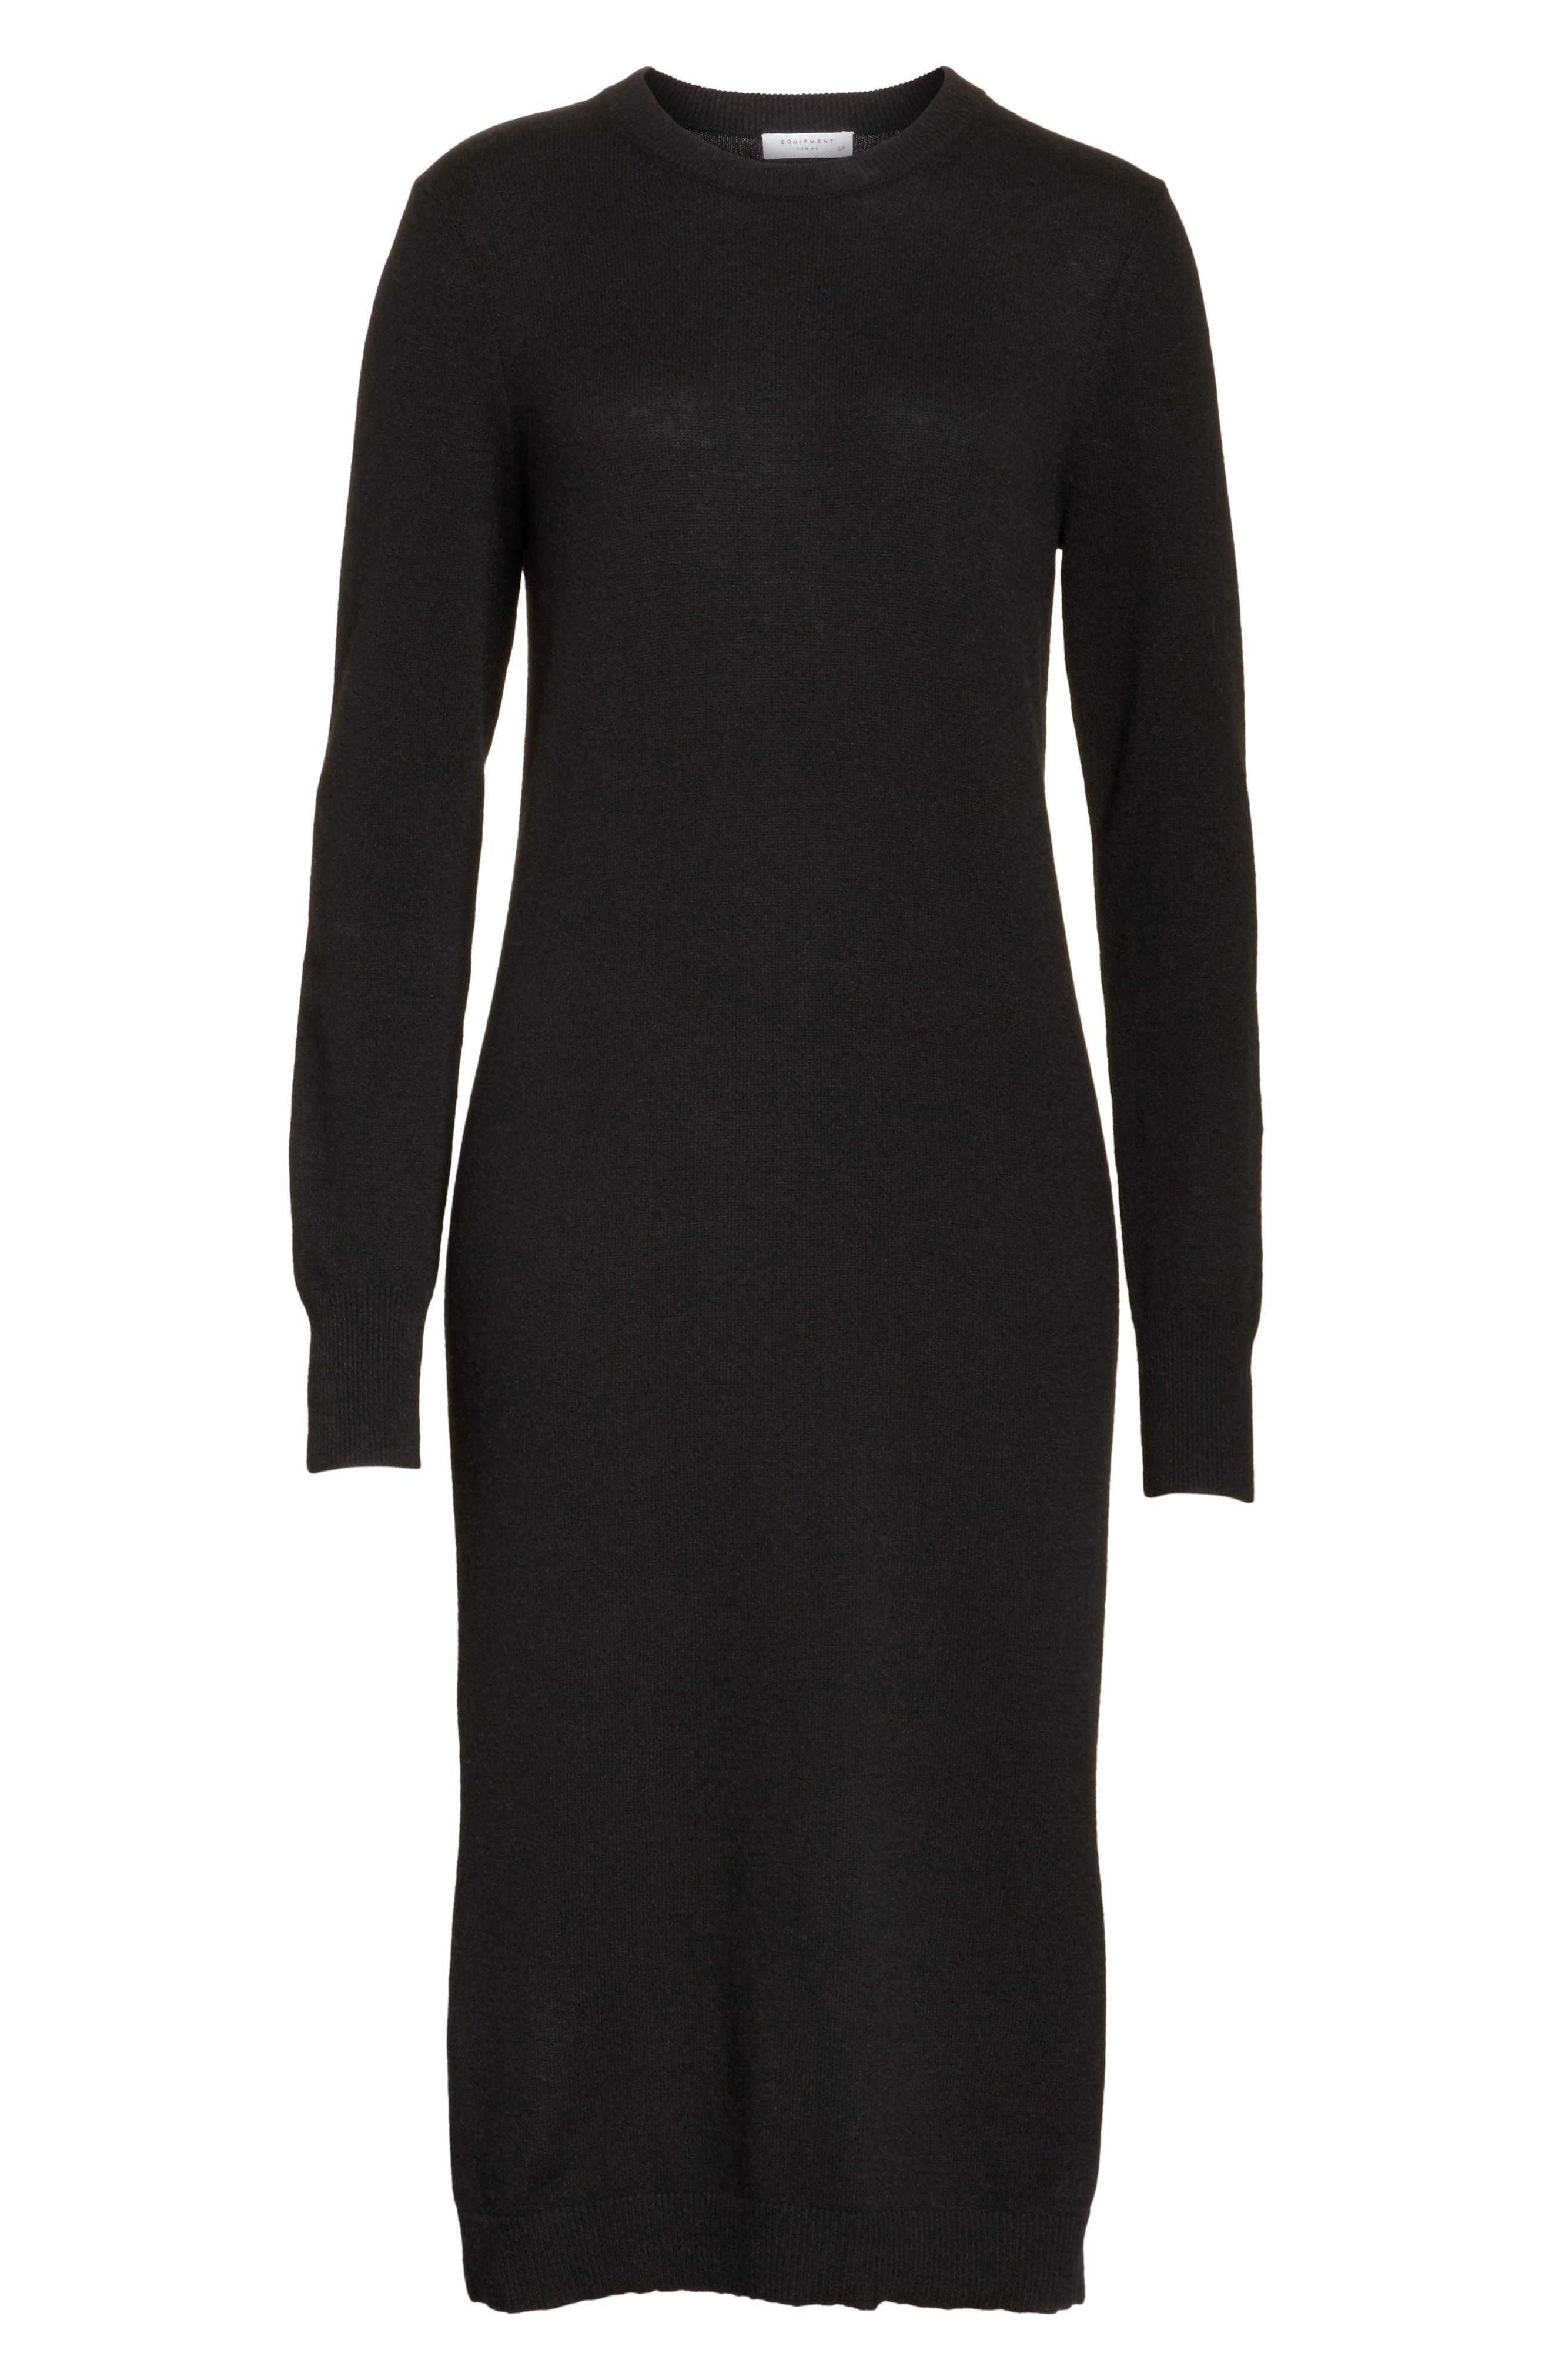 Snyder Cashmere Knit Midi Dress,                             Alternate thumbnail 6, color,                             001